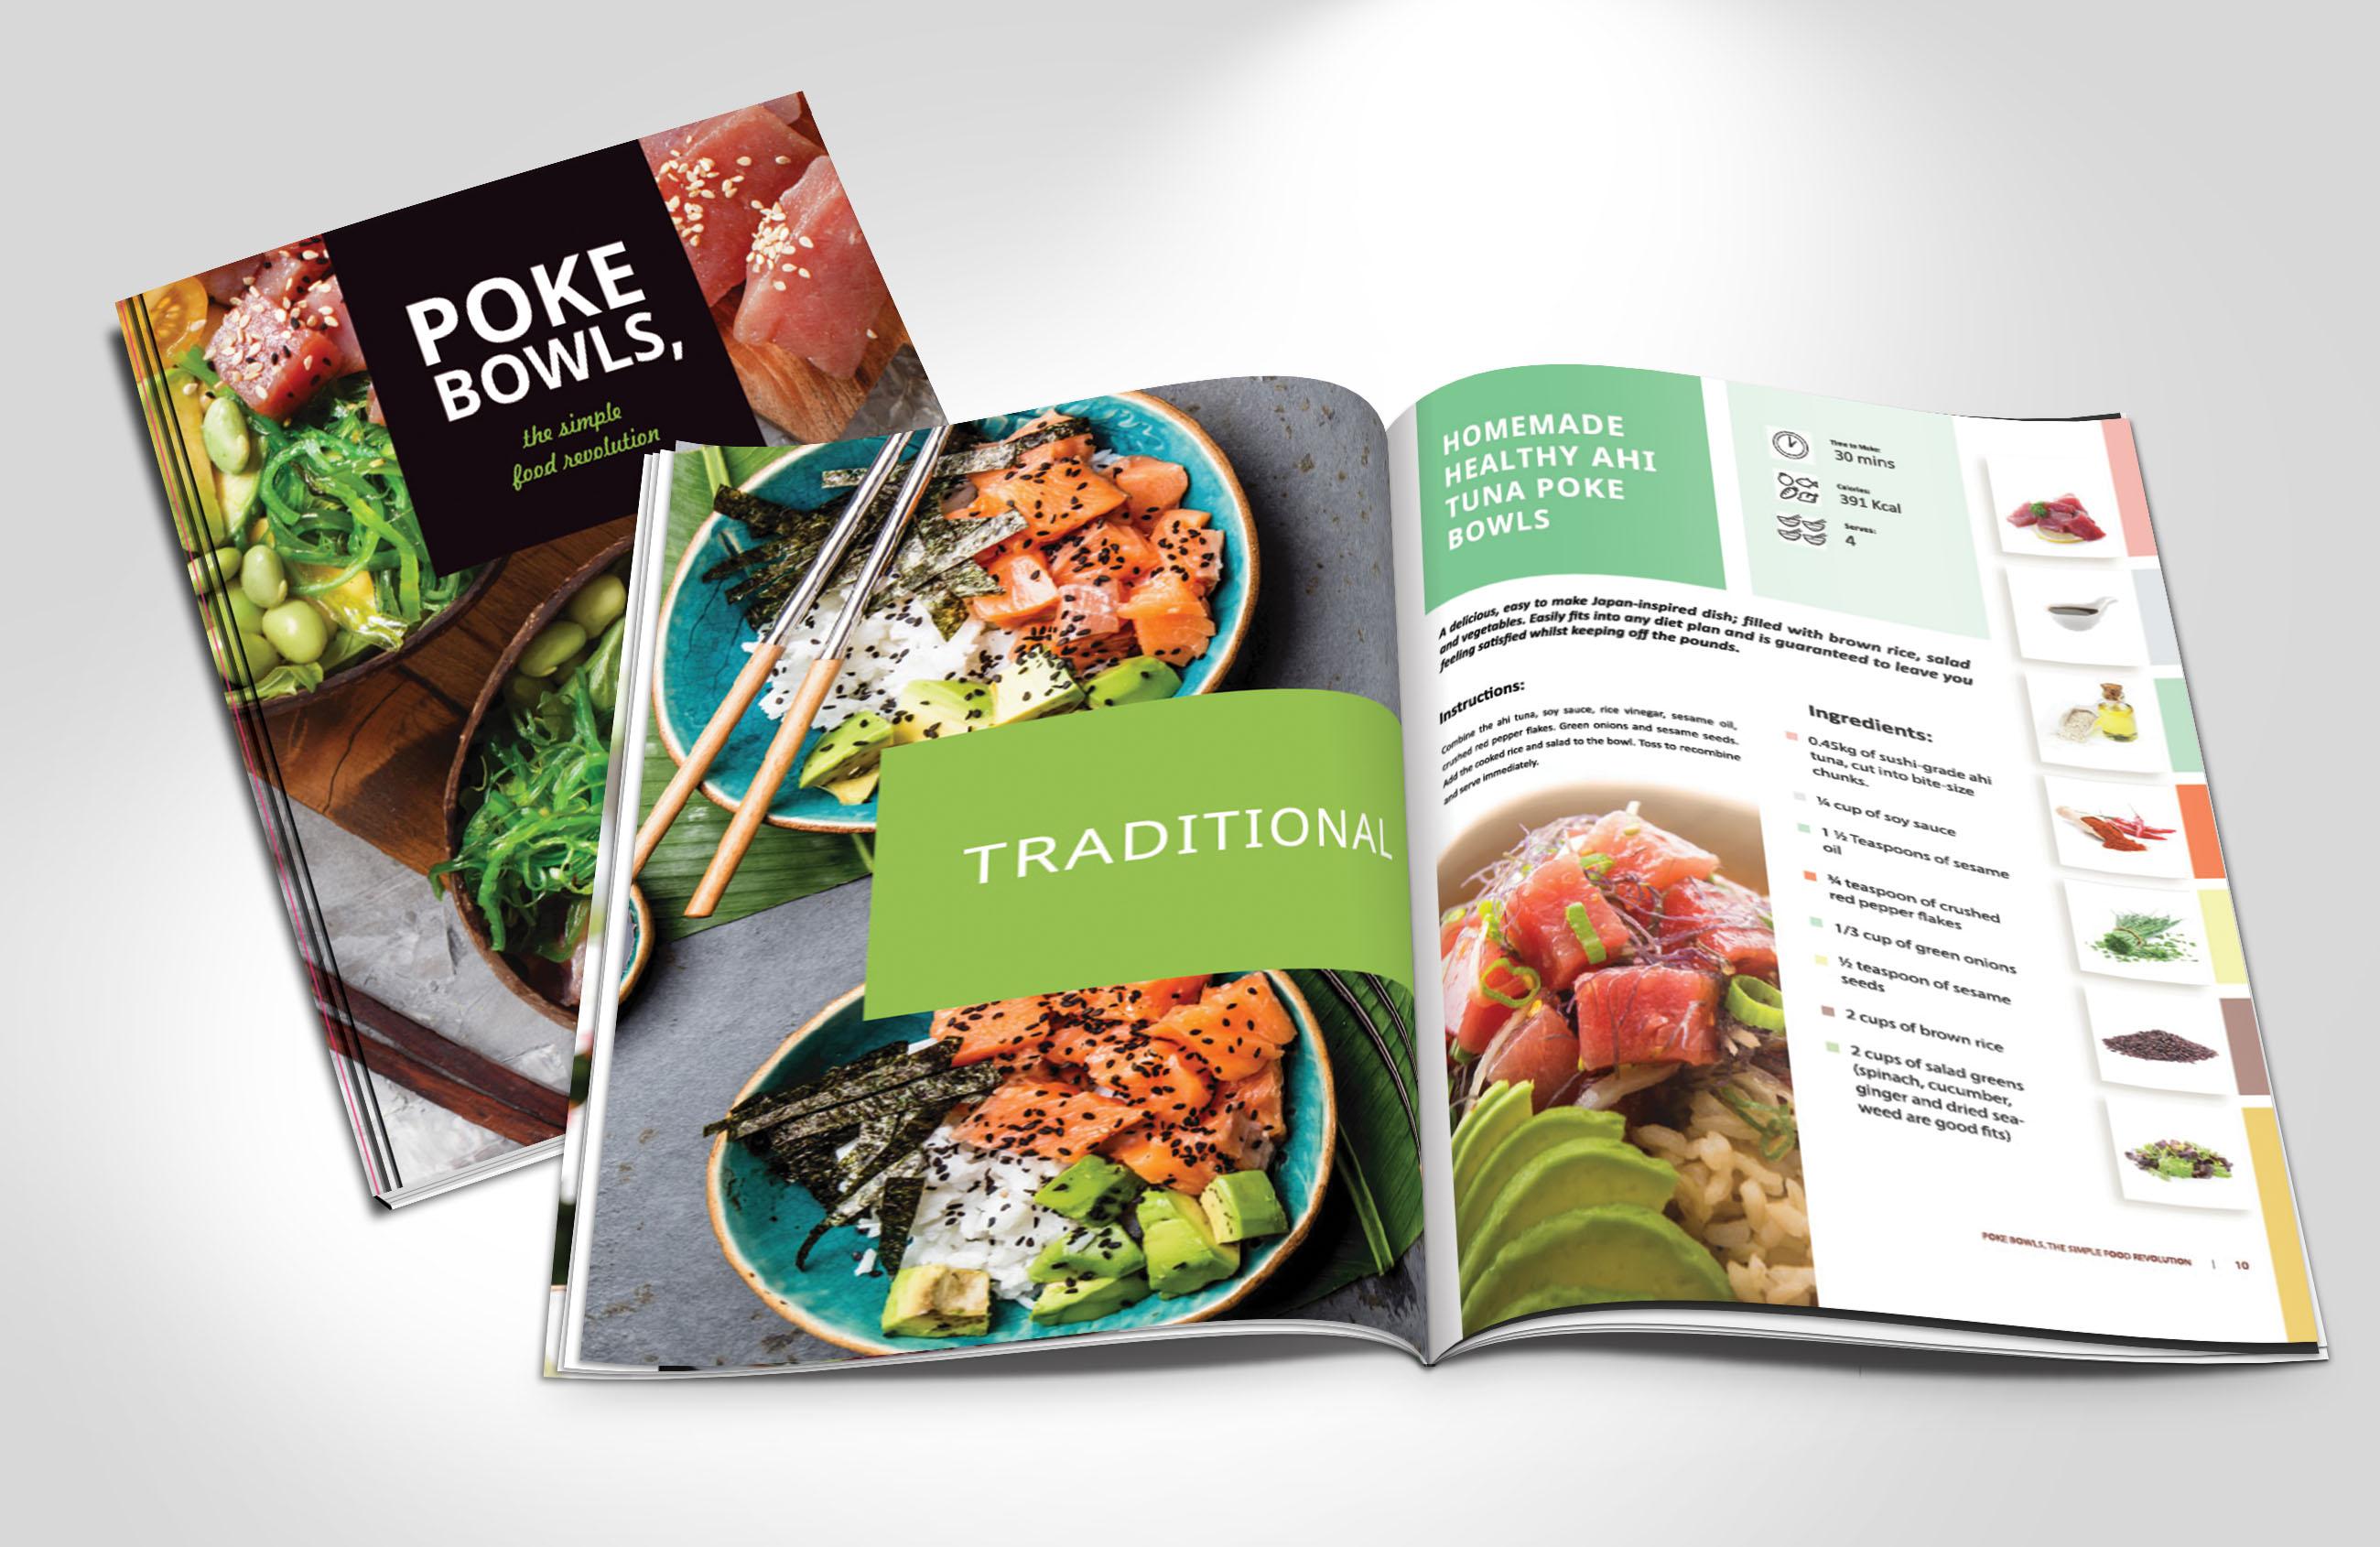 Фото Дизайн обложки и верстка страниц журнала.